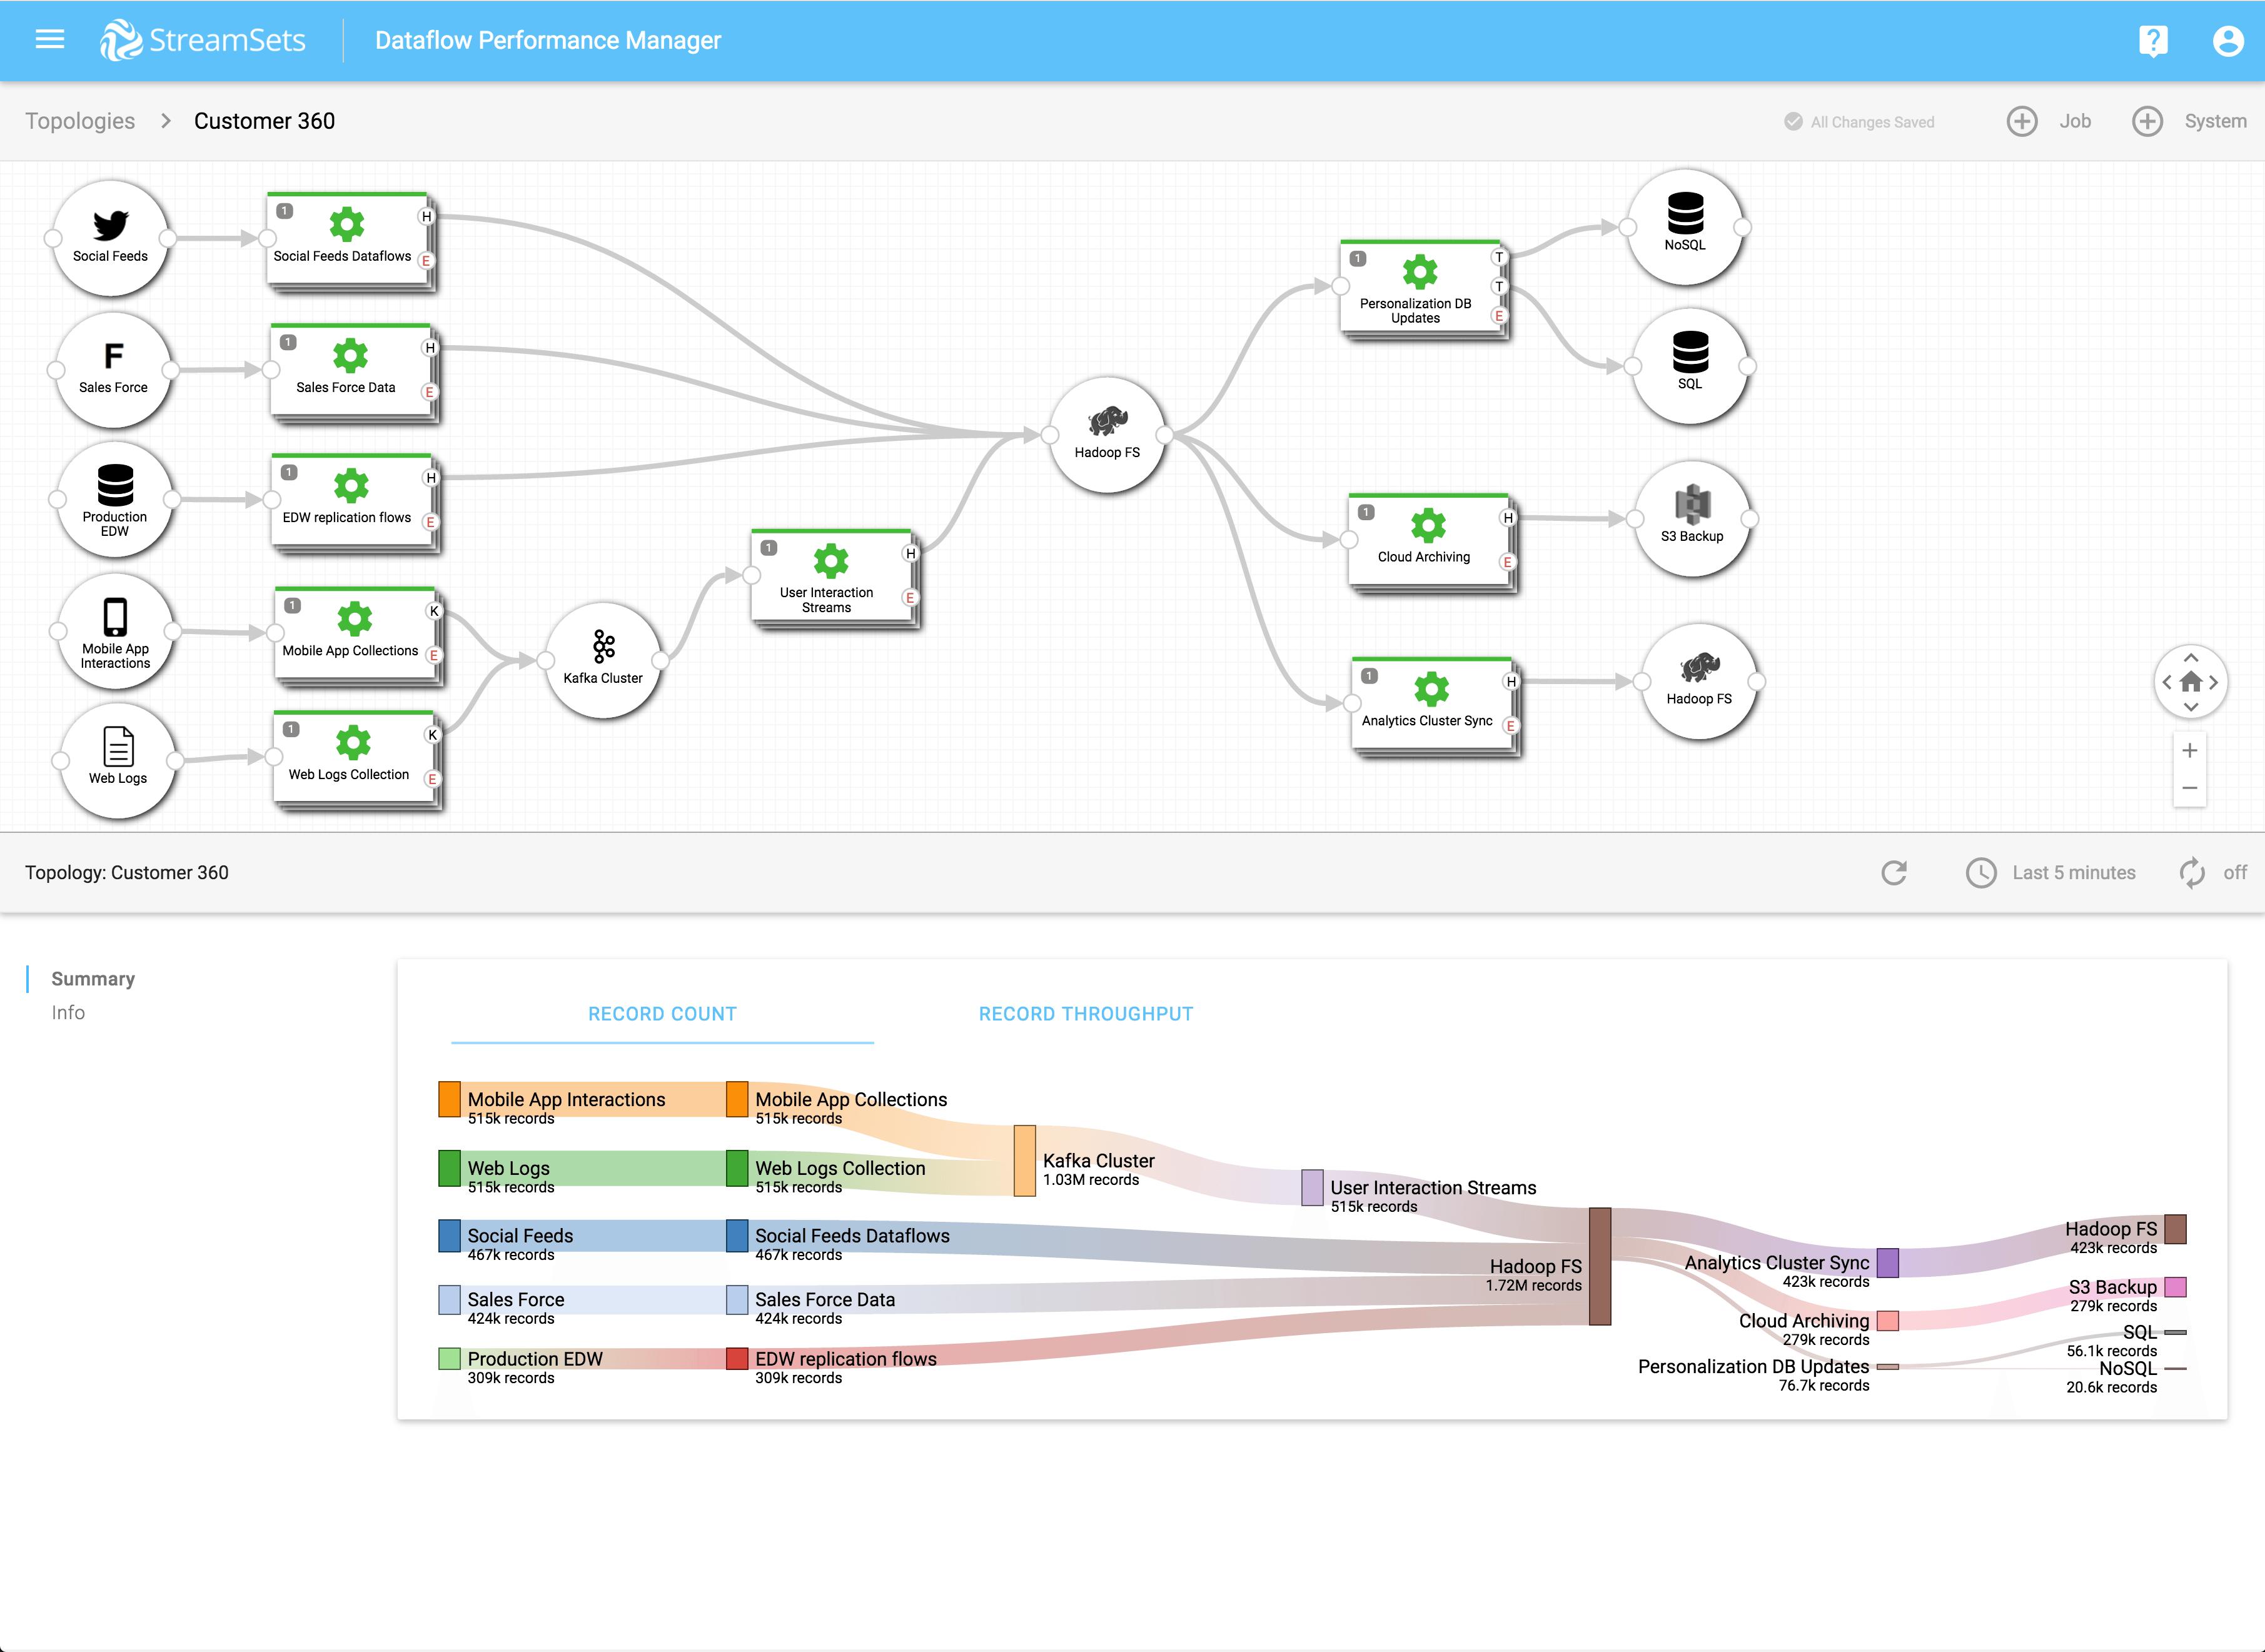 Data Performance Manager - Screenshot:Map